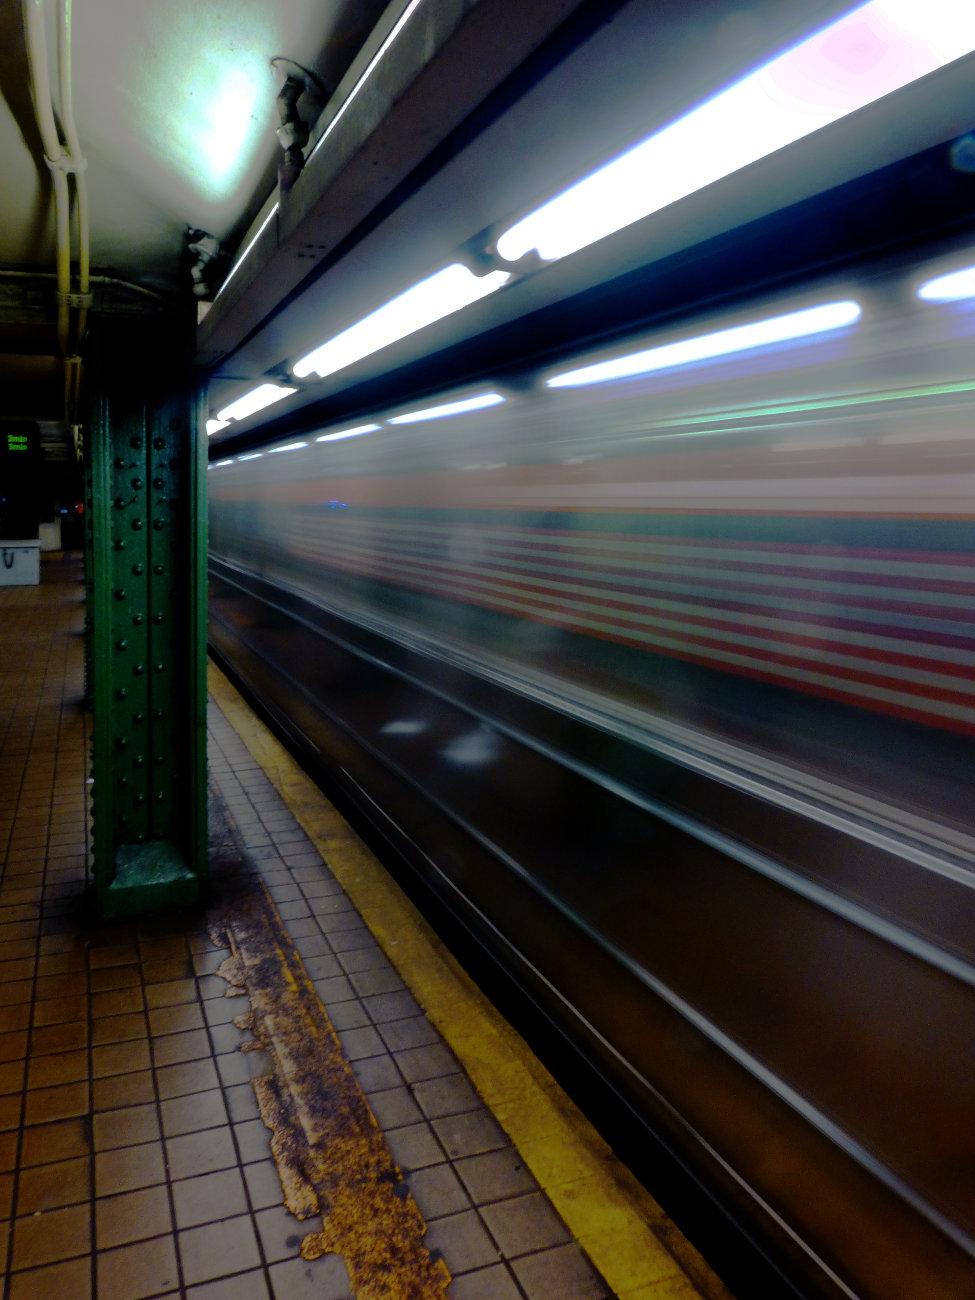 G-train